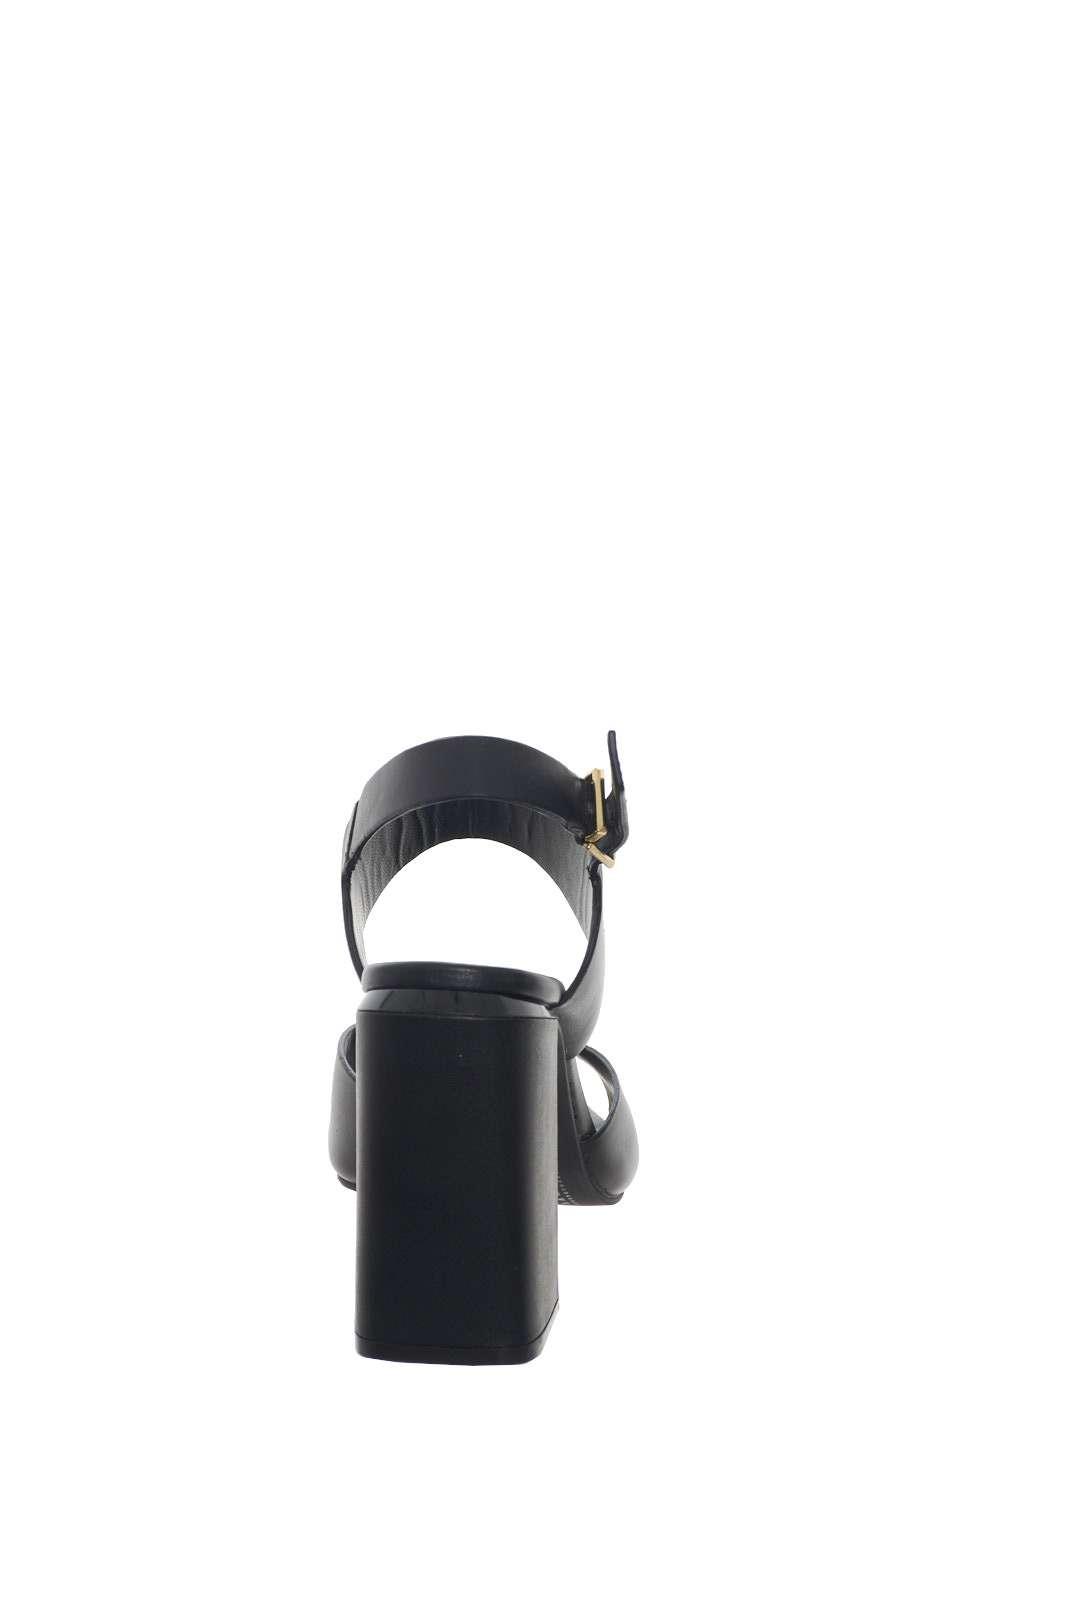 https://www.parmax.com/media/catalog/product/a/i/PE-outlet_parmax-sandali-donna-Bruno-Premi-bw1402p-D.jpg